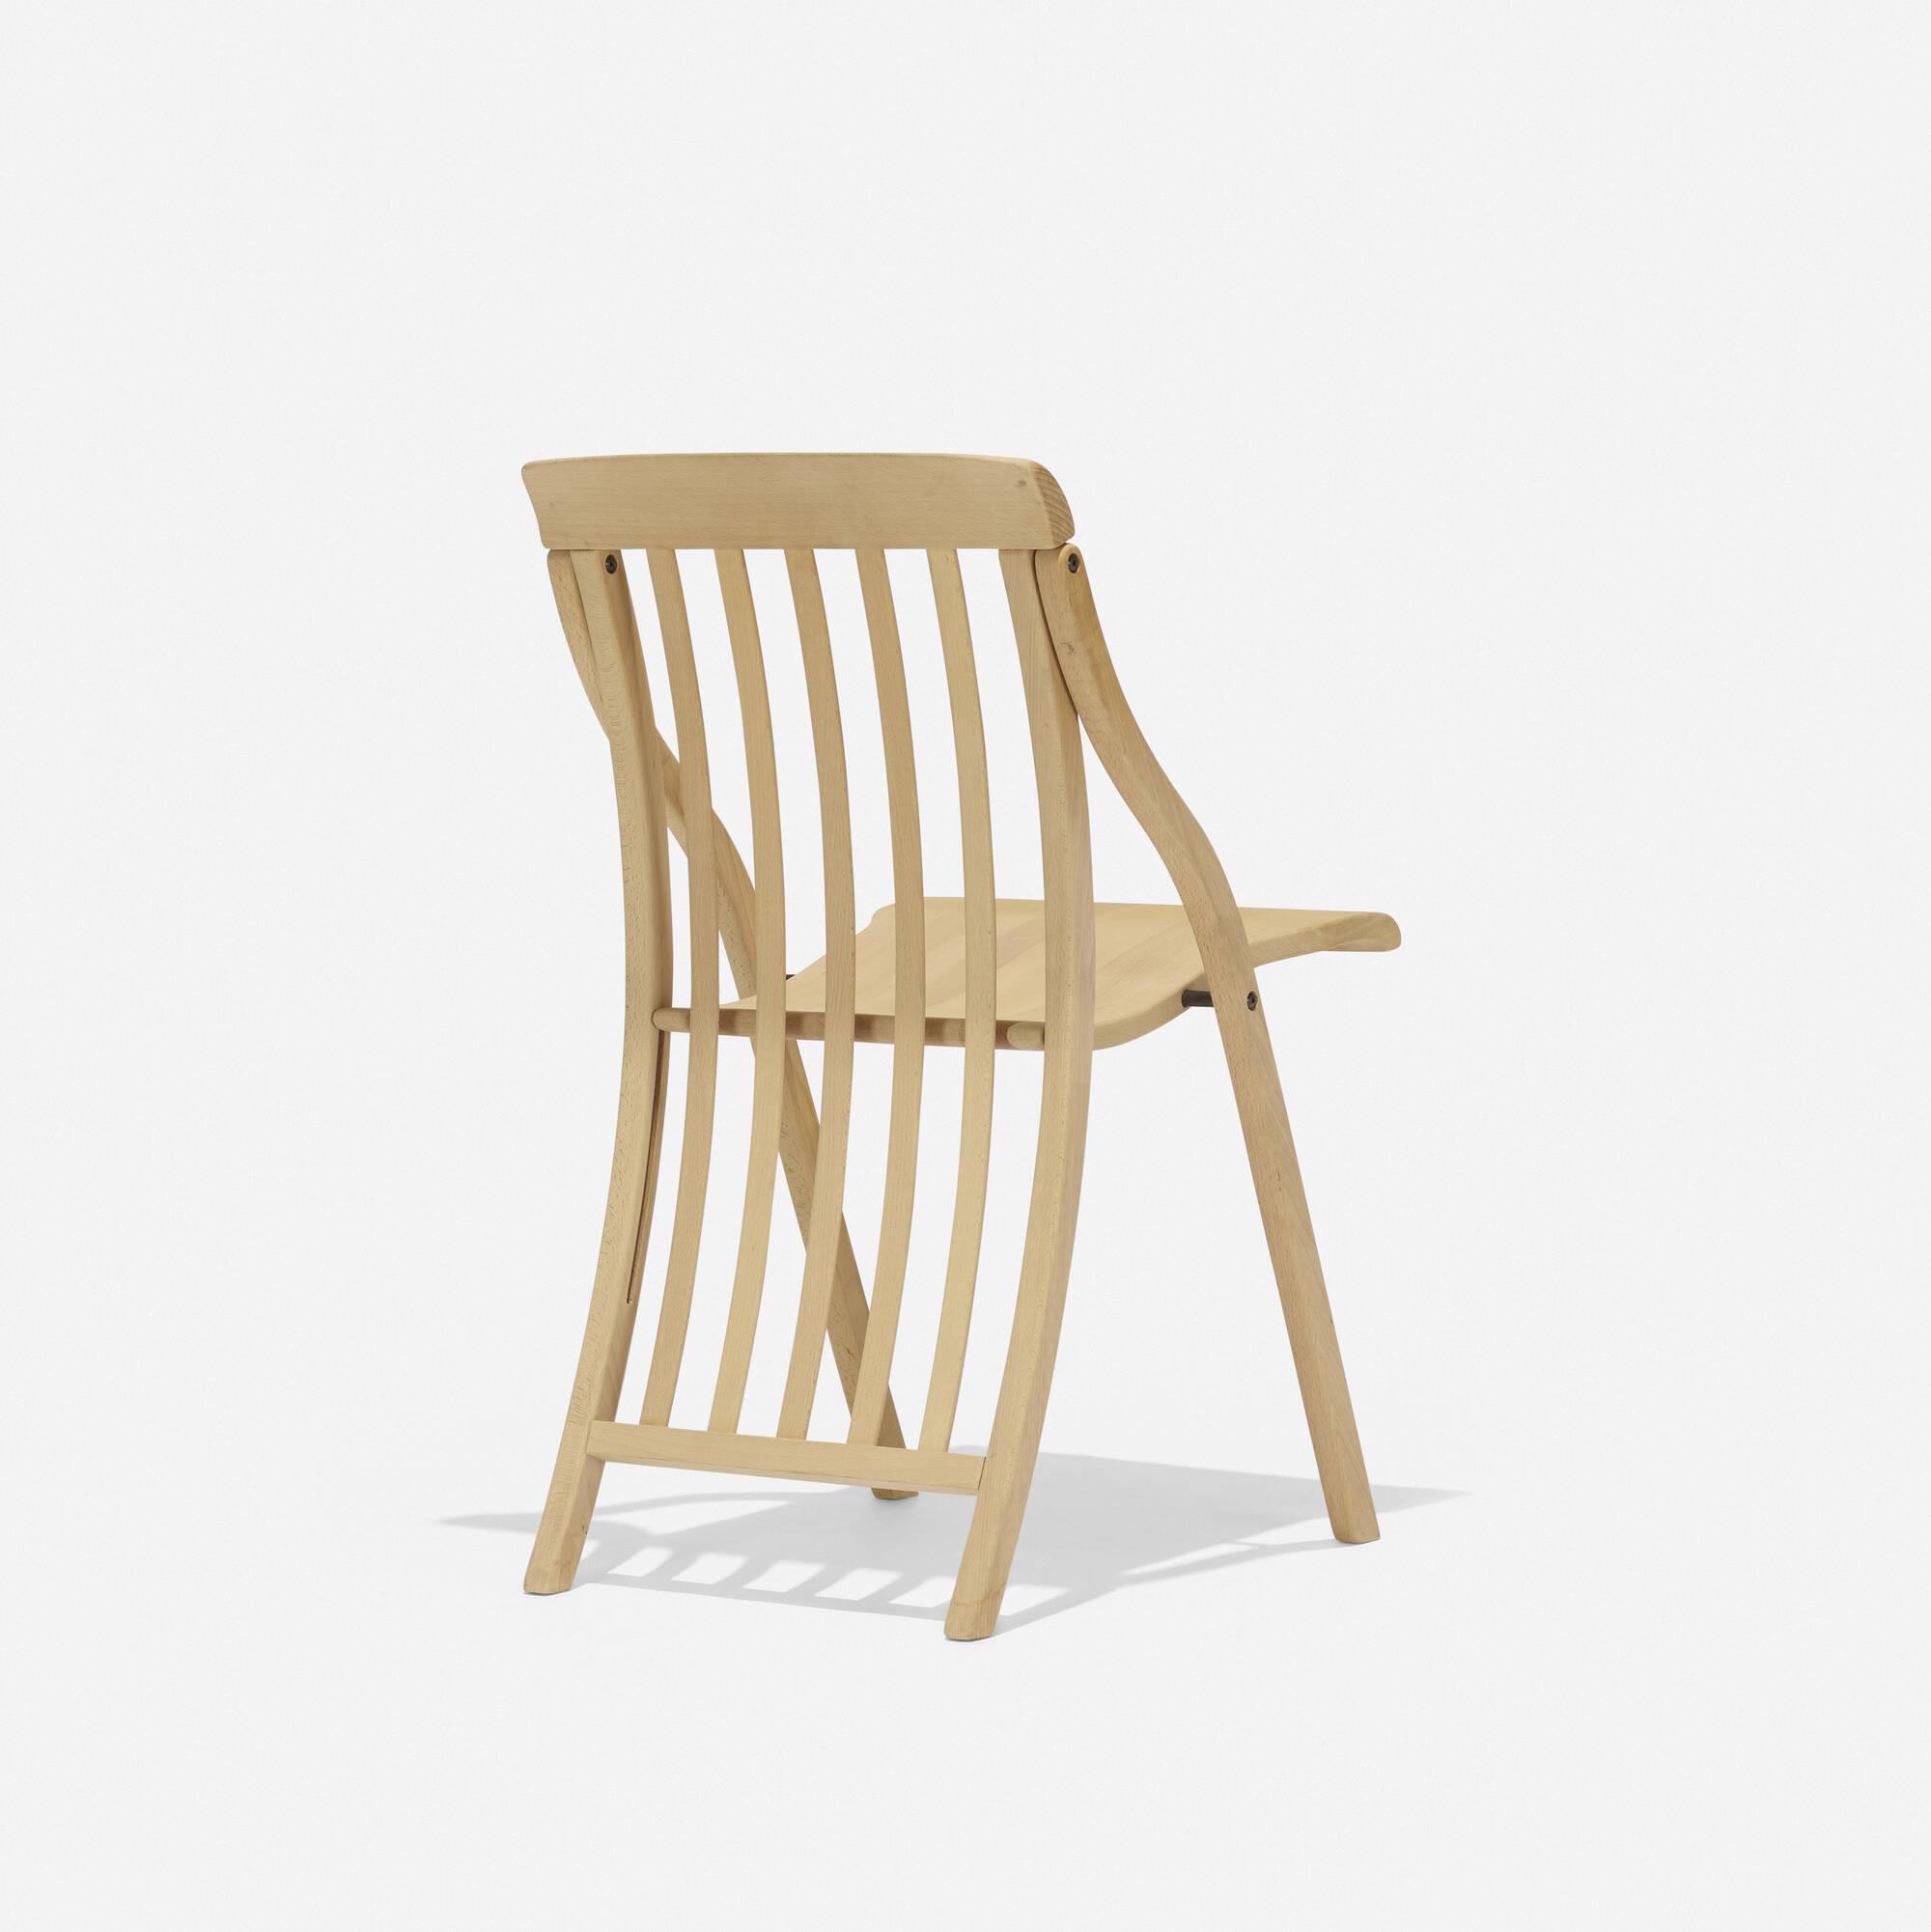 folding chair auction unfinished wood frames 355 michele de lucchi sedia